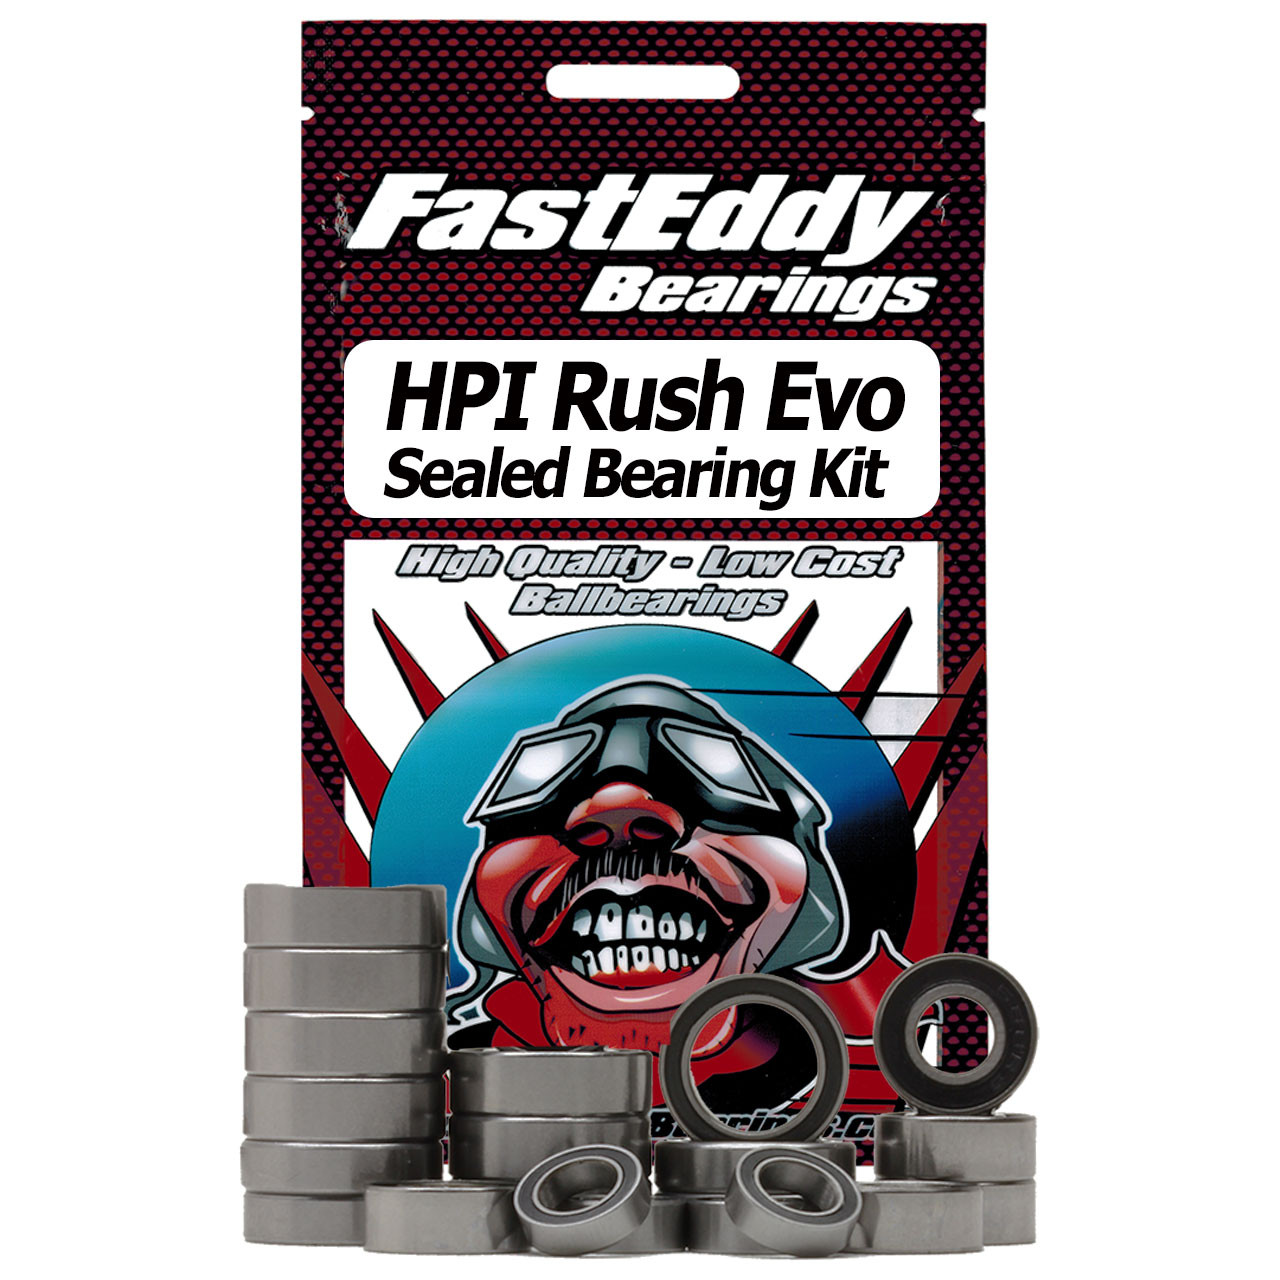 HPI Rush Evo Sealed Bearing Kit